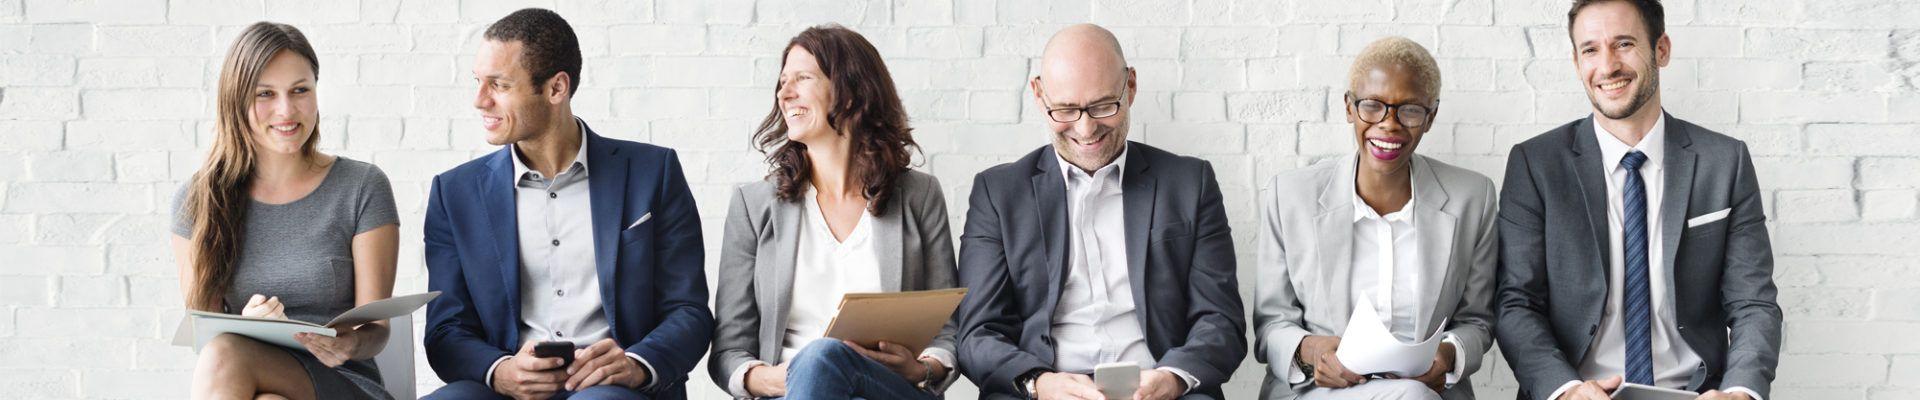 recrutement offre d'emploi locarchives